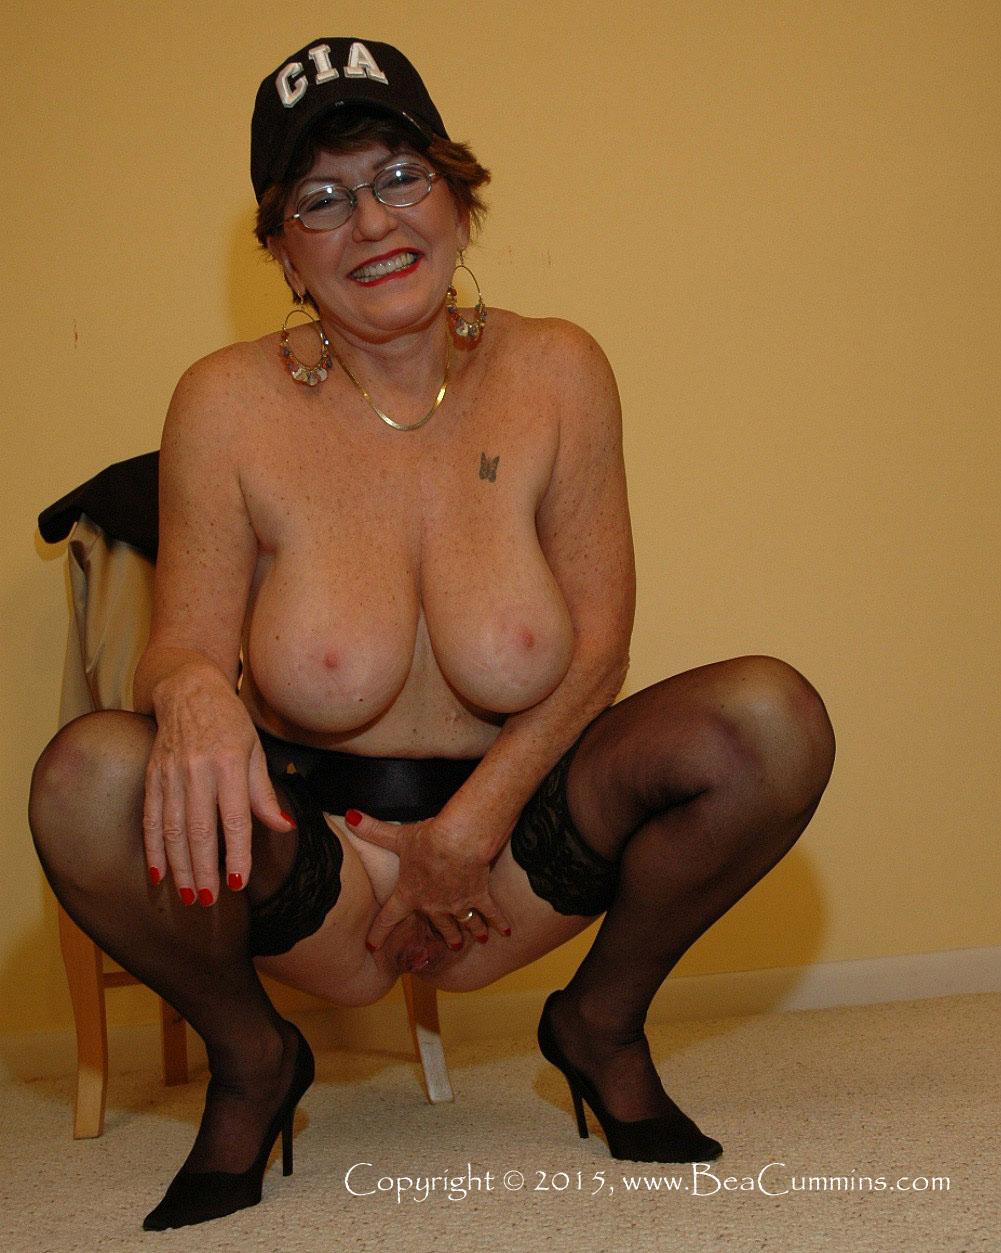 Anal Cummins Granny Bea